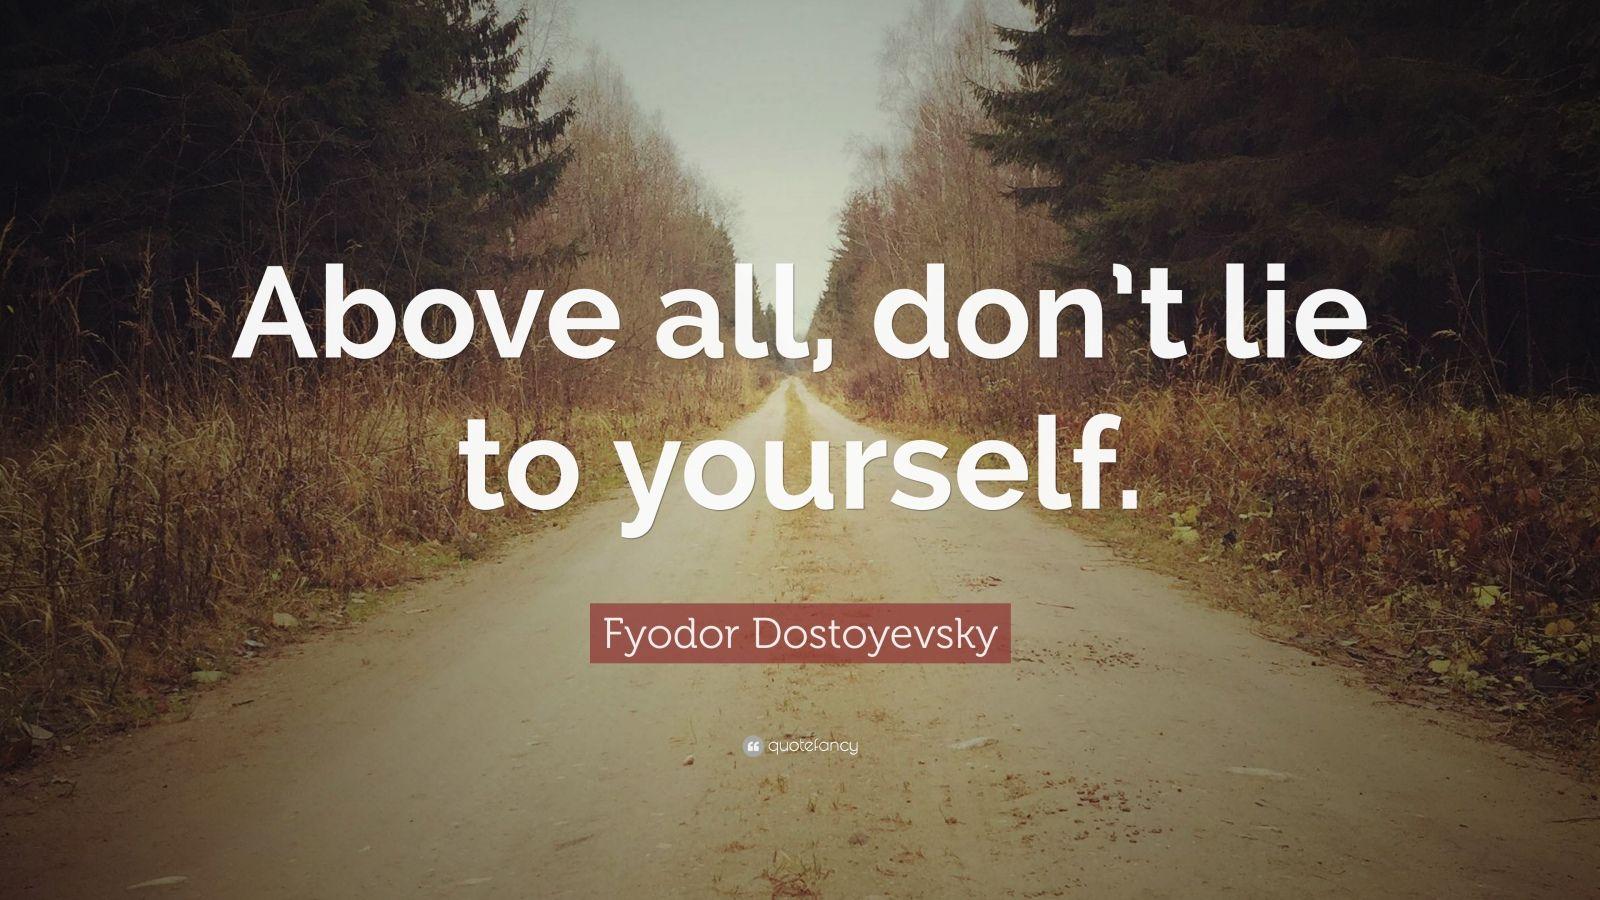 Fyodor Dostoyevsky Quotes 100 Wallpapers Quotefancy